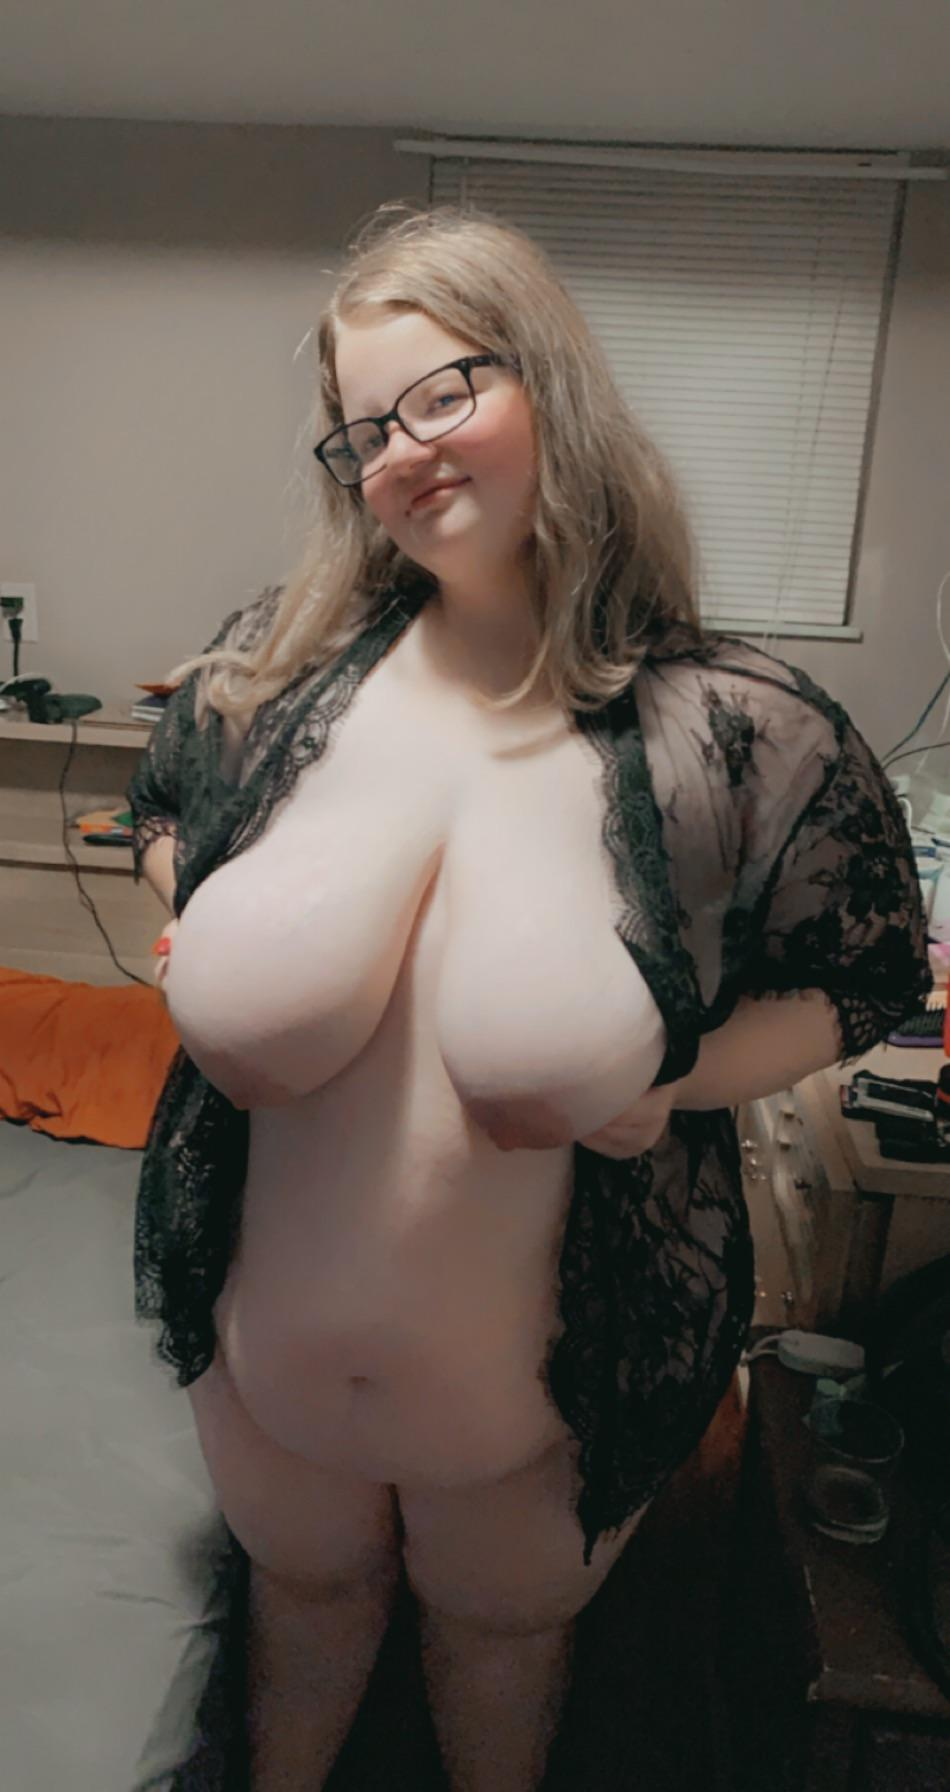 Huge Tits Reddit photo 20